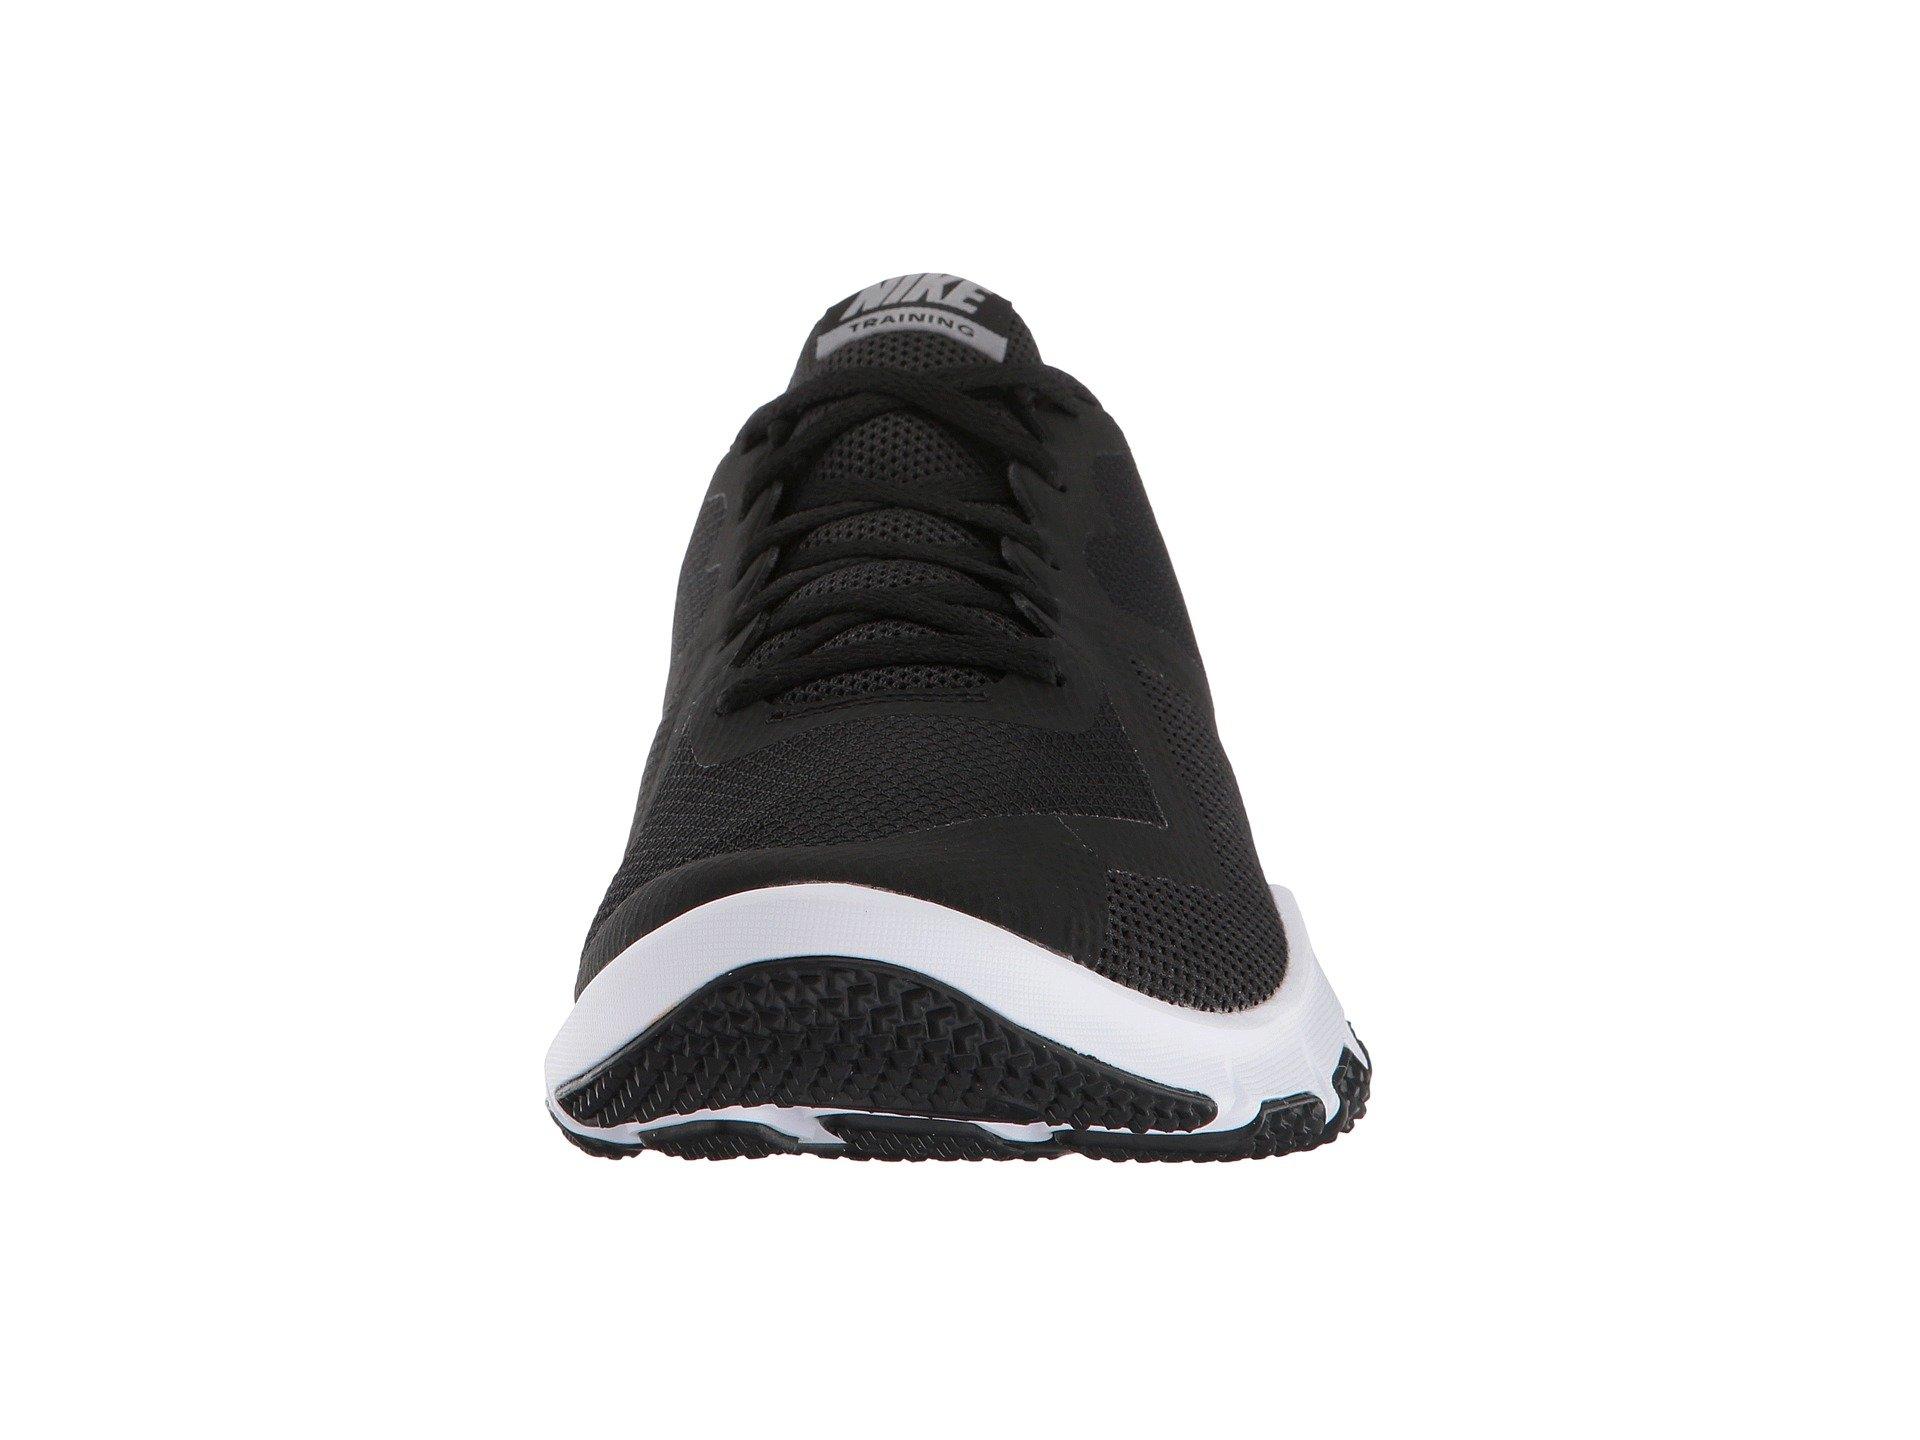 ba8a4f8174ef Nike Free Run Kid Trainers For Mens